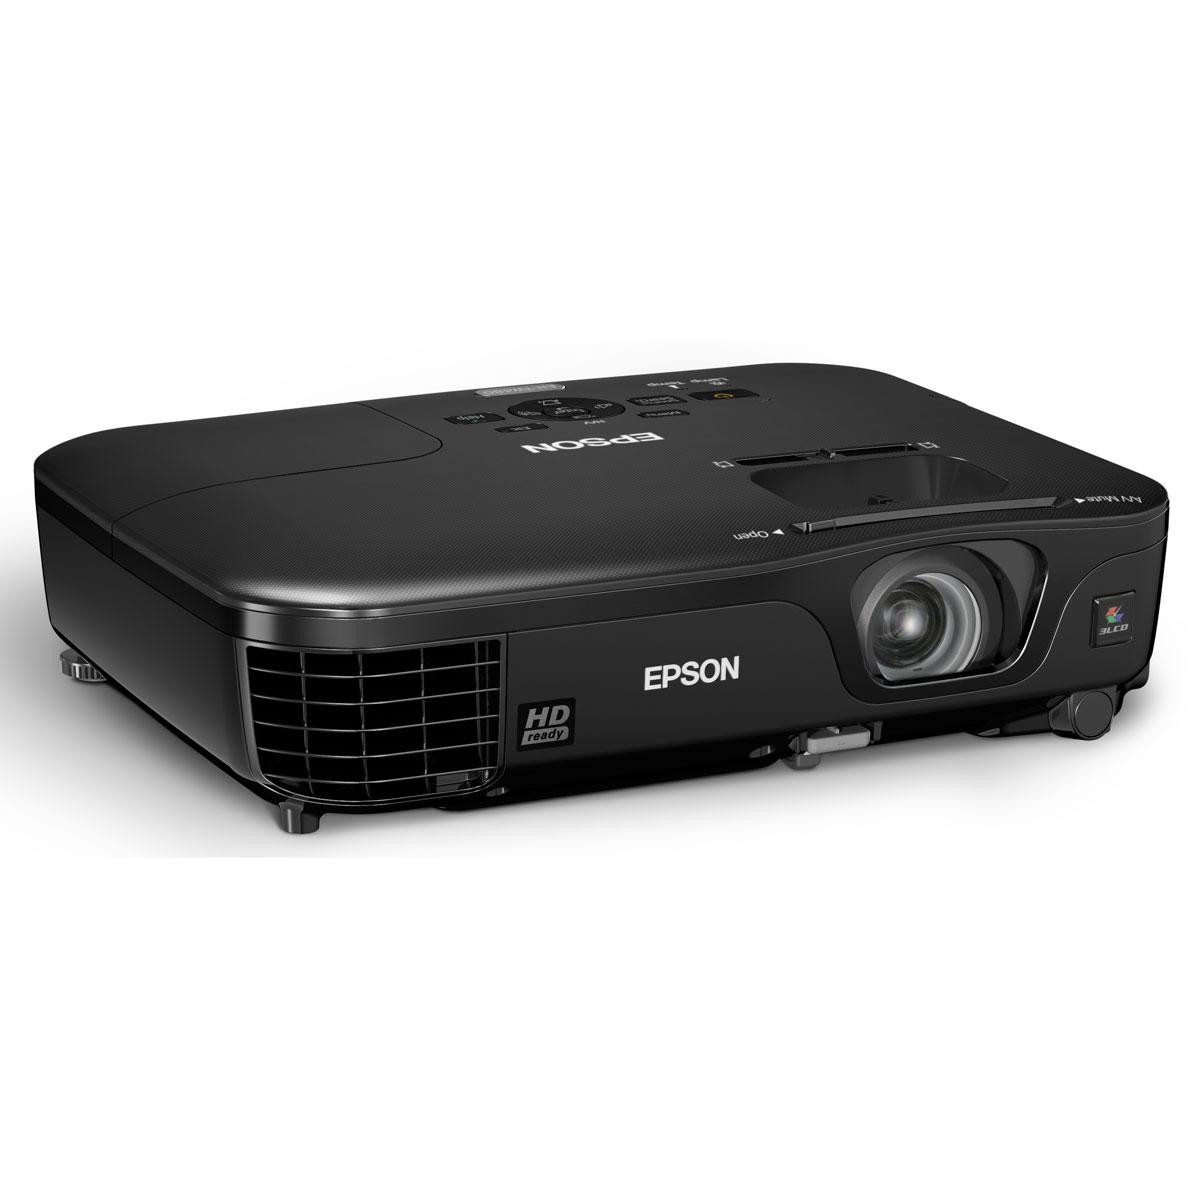 Epson eh tw480 ldlc ecran manuel vid oprojecteur epson - Meuble ecran videoprojecteur ...